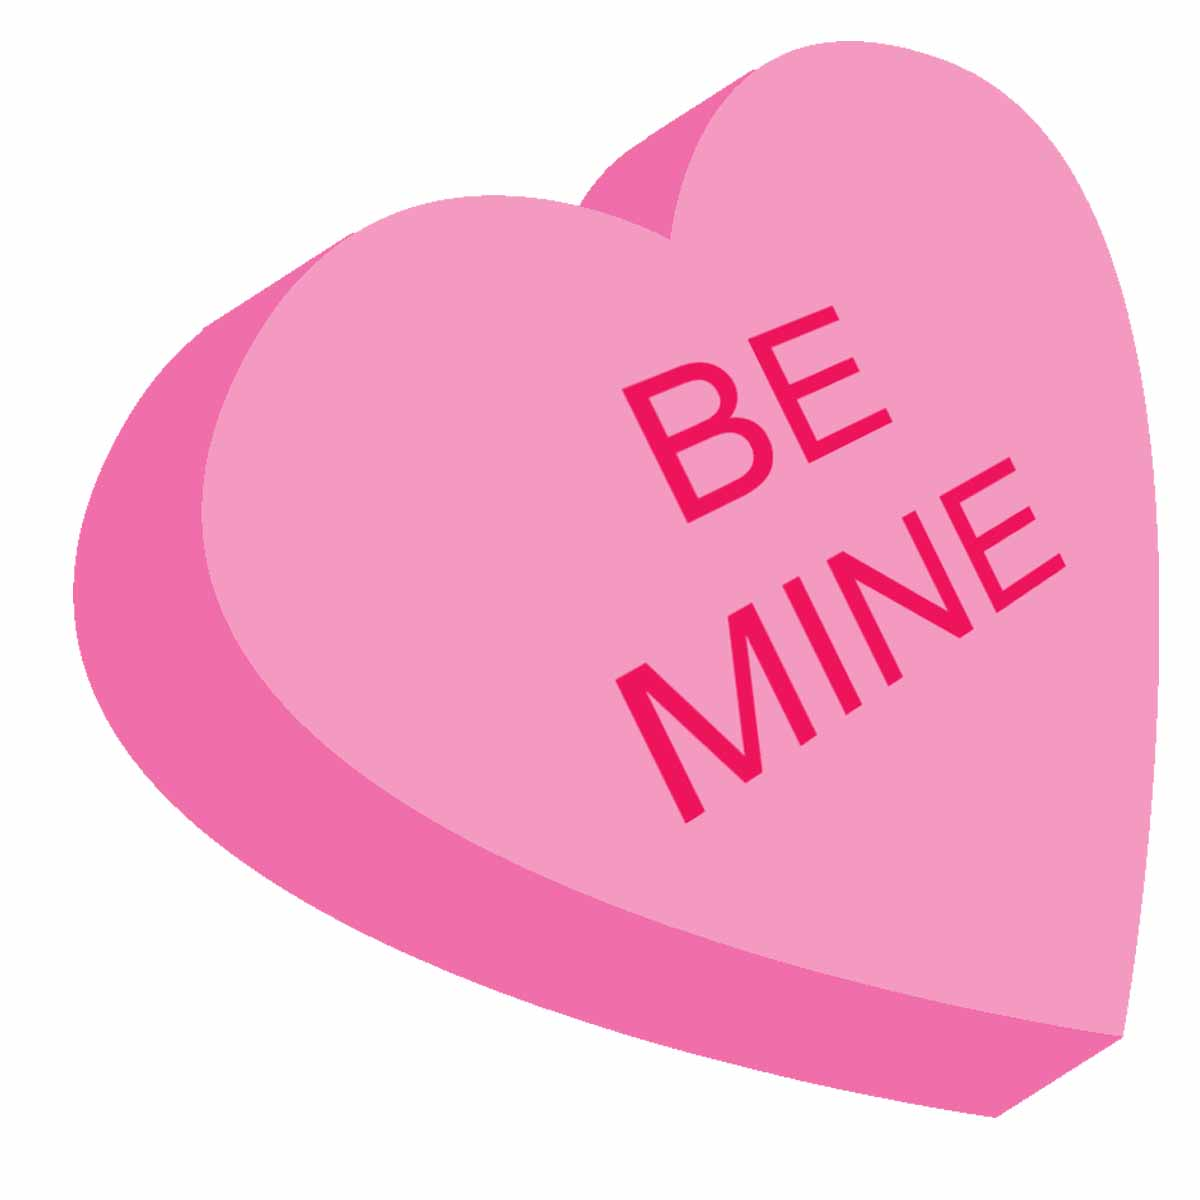 1200x1200 Valentine Heart Images Clip Art